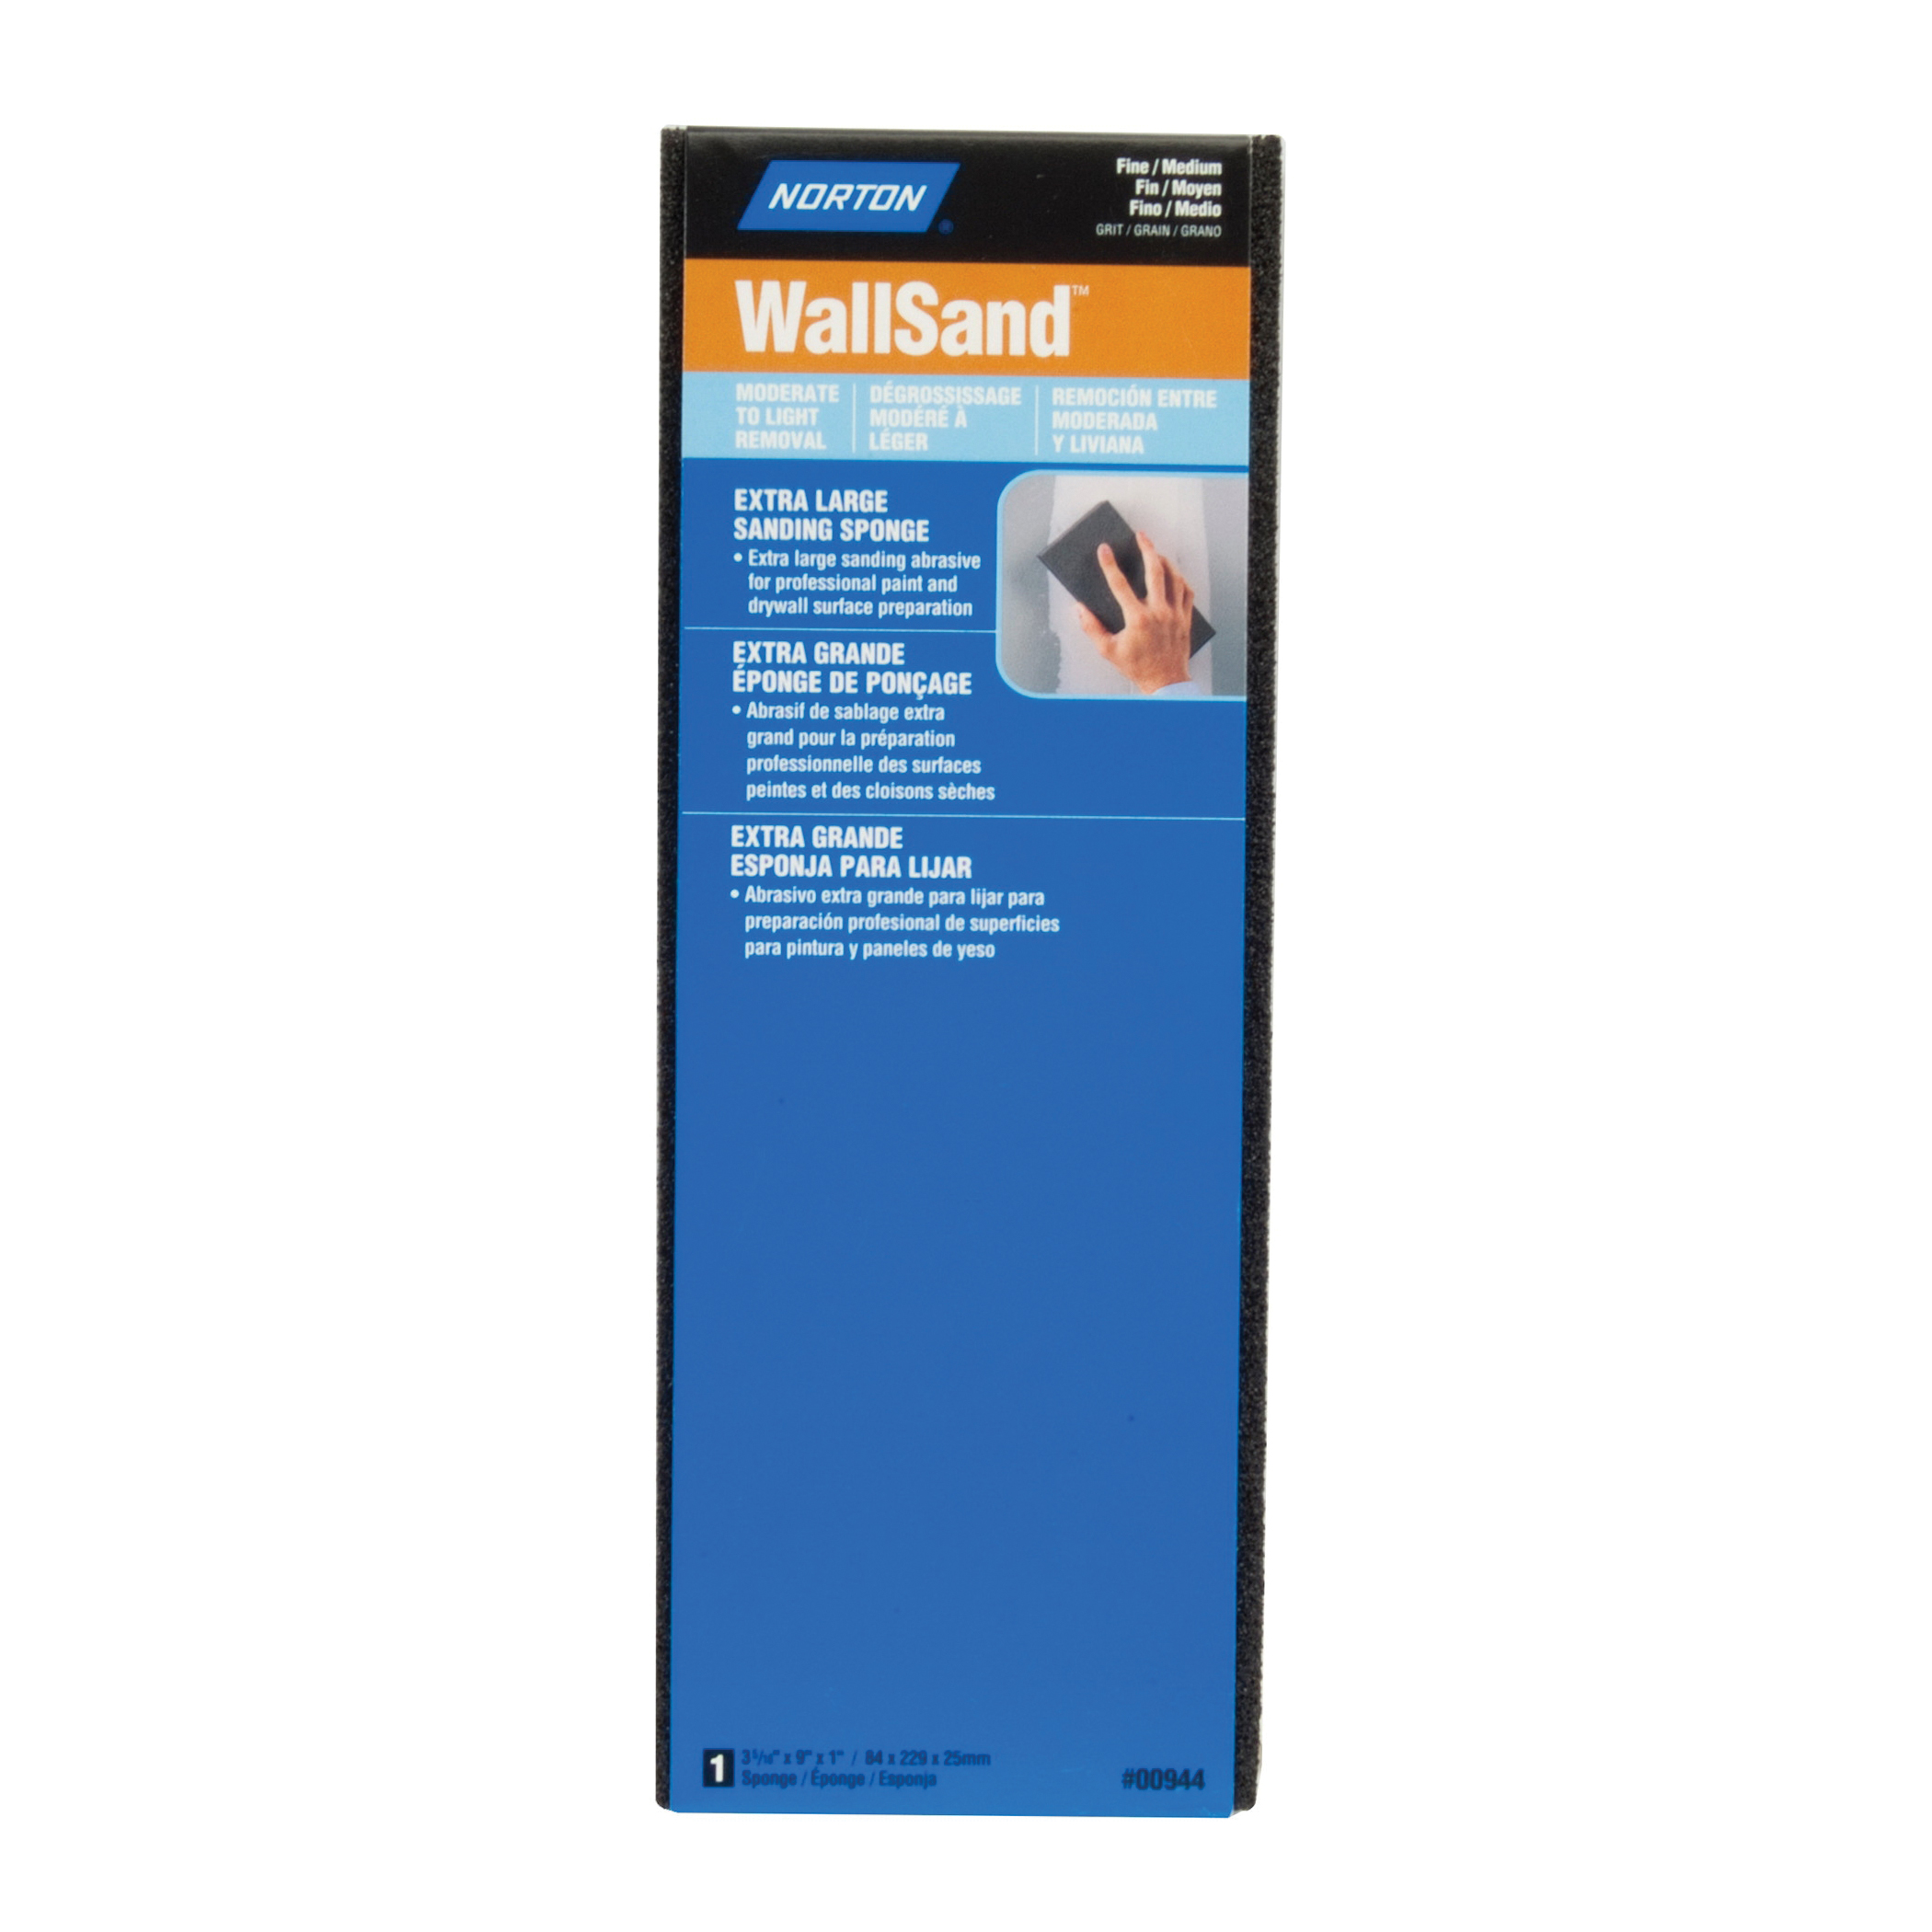 Norton® WallSand™ 07660700944 Extra Large Area Sanding Sponge, 9 in L x 3-5/16 in W x 1 in THK, 80/120 Grit, Fine/Medium Grade